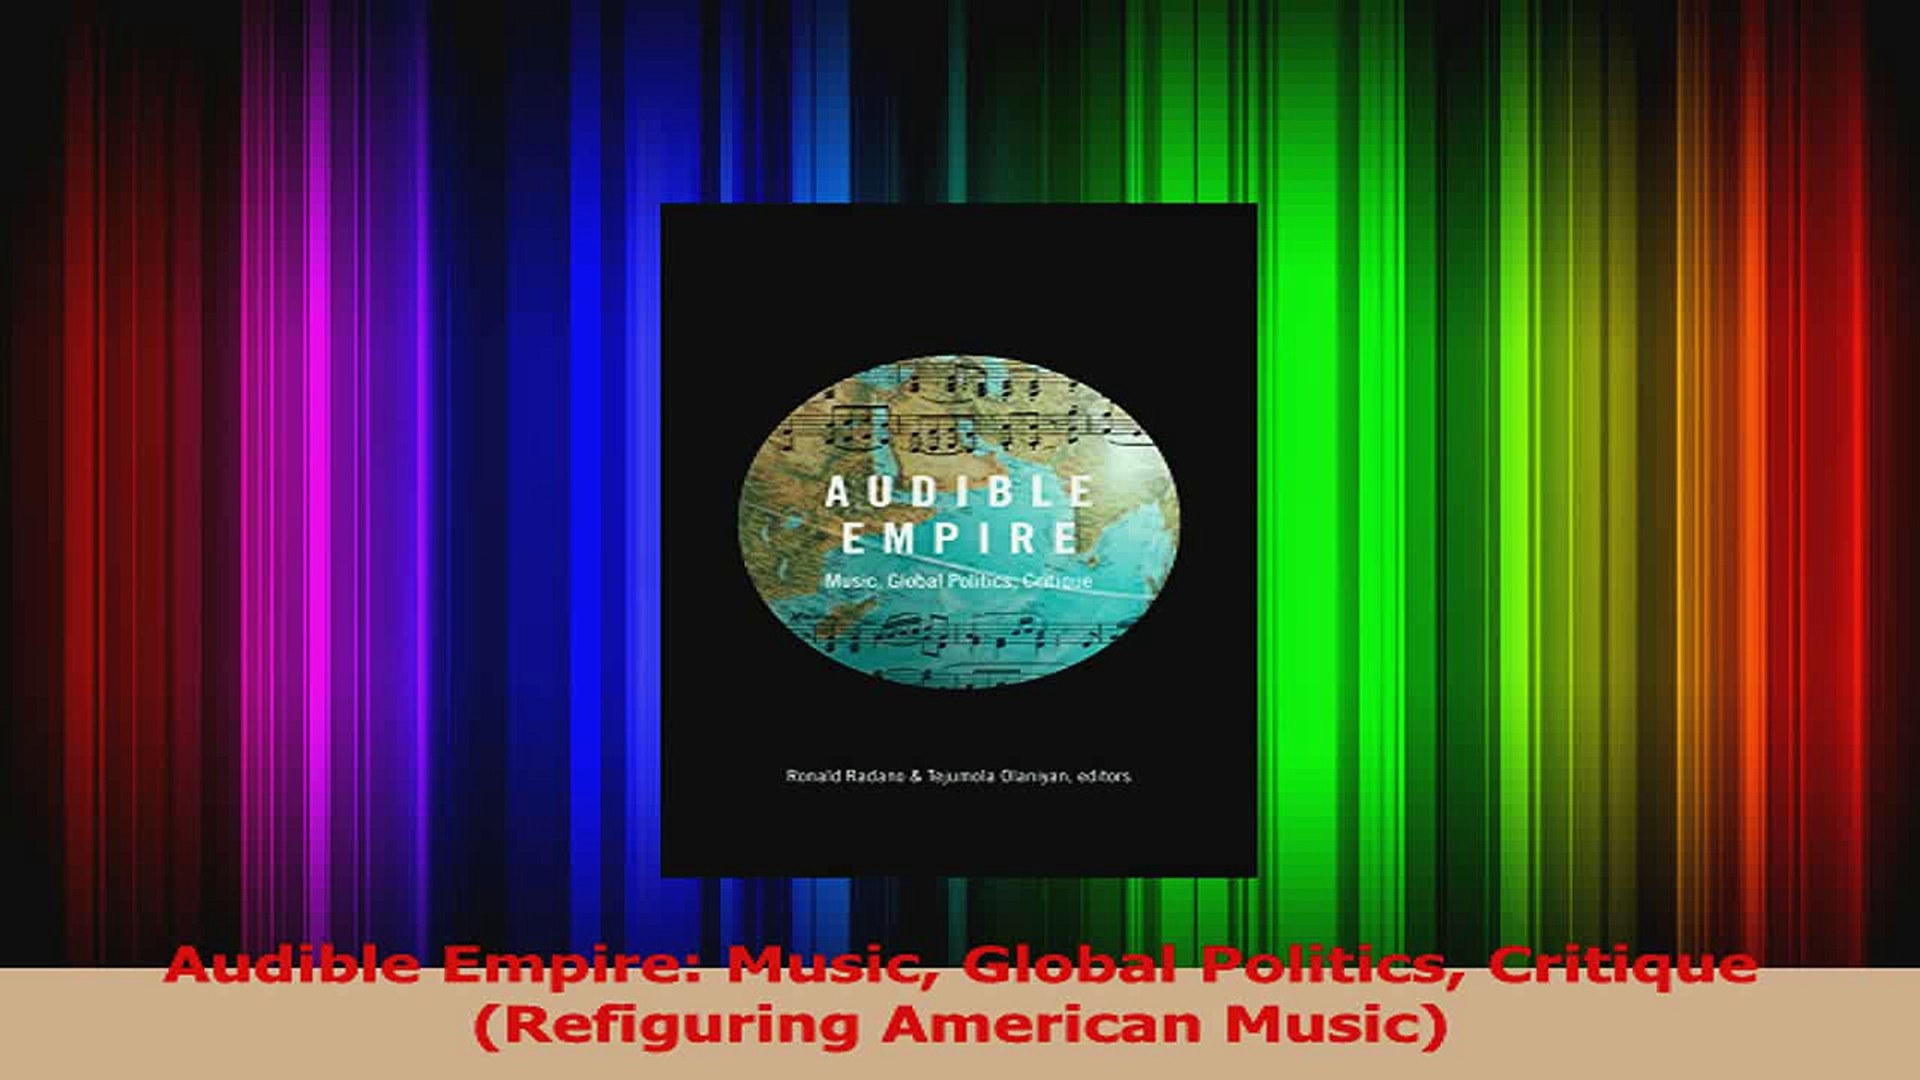 PDF Download  Audible Empire Music Global Politics Critique Refiguring American Music Download Onlin